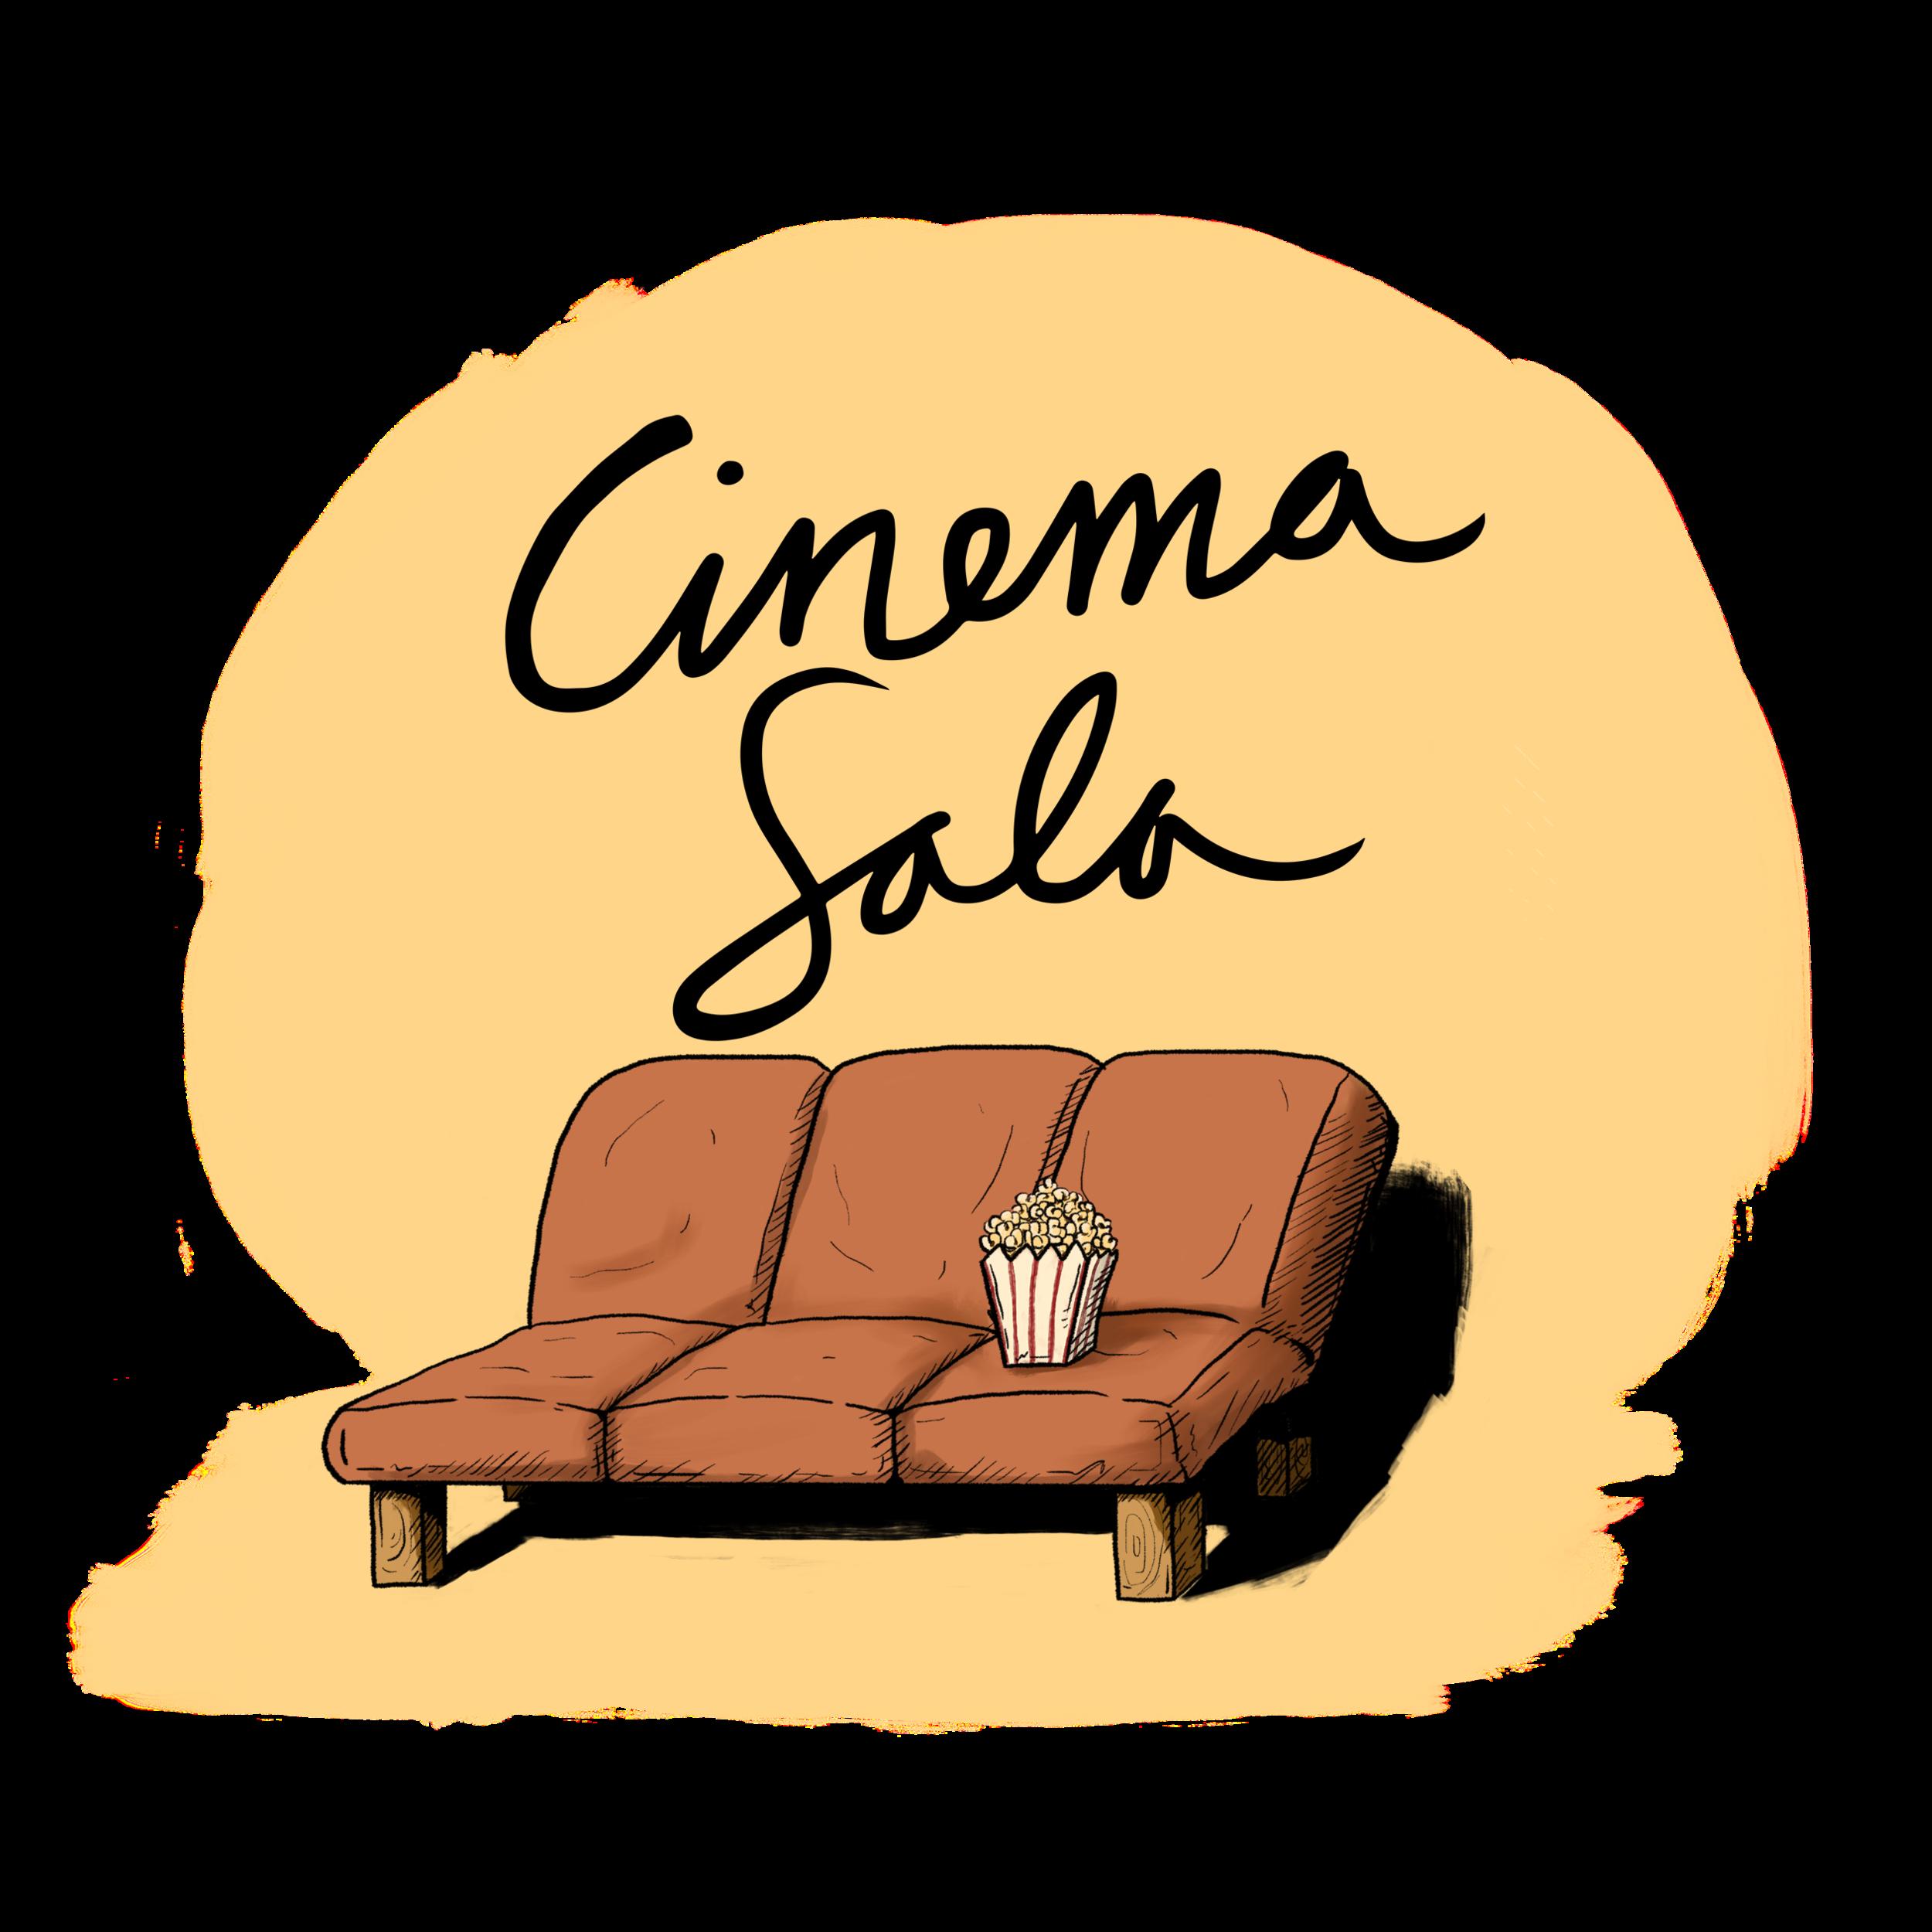 CinemaSala_Color Square Alpha.png